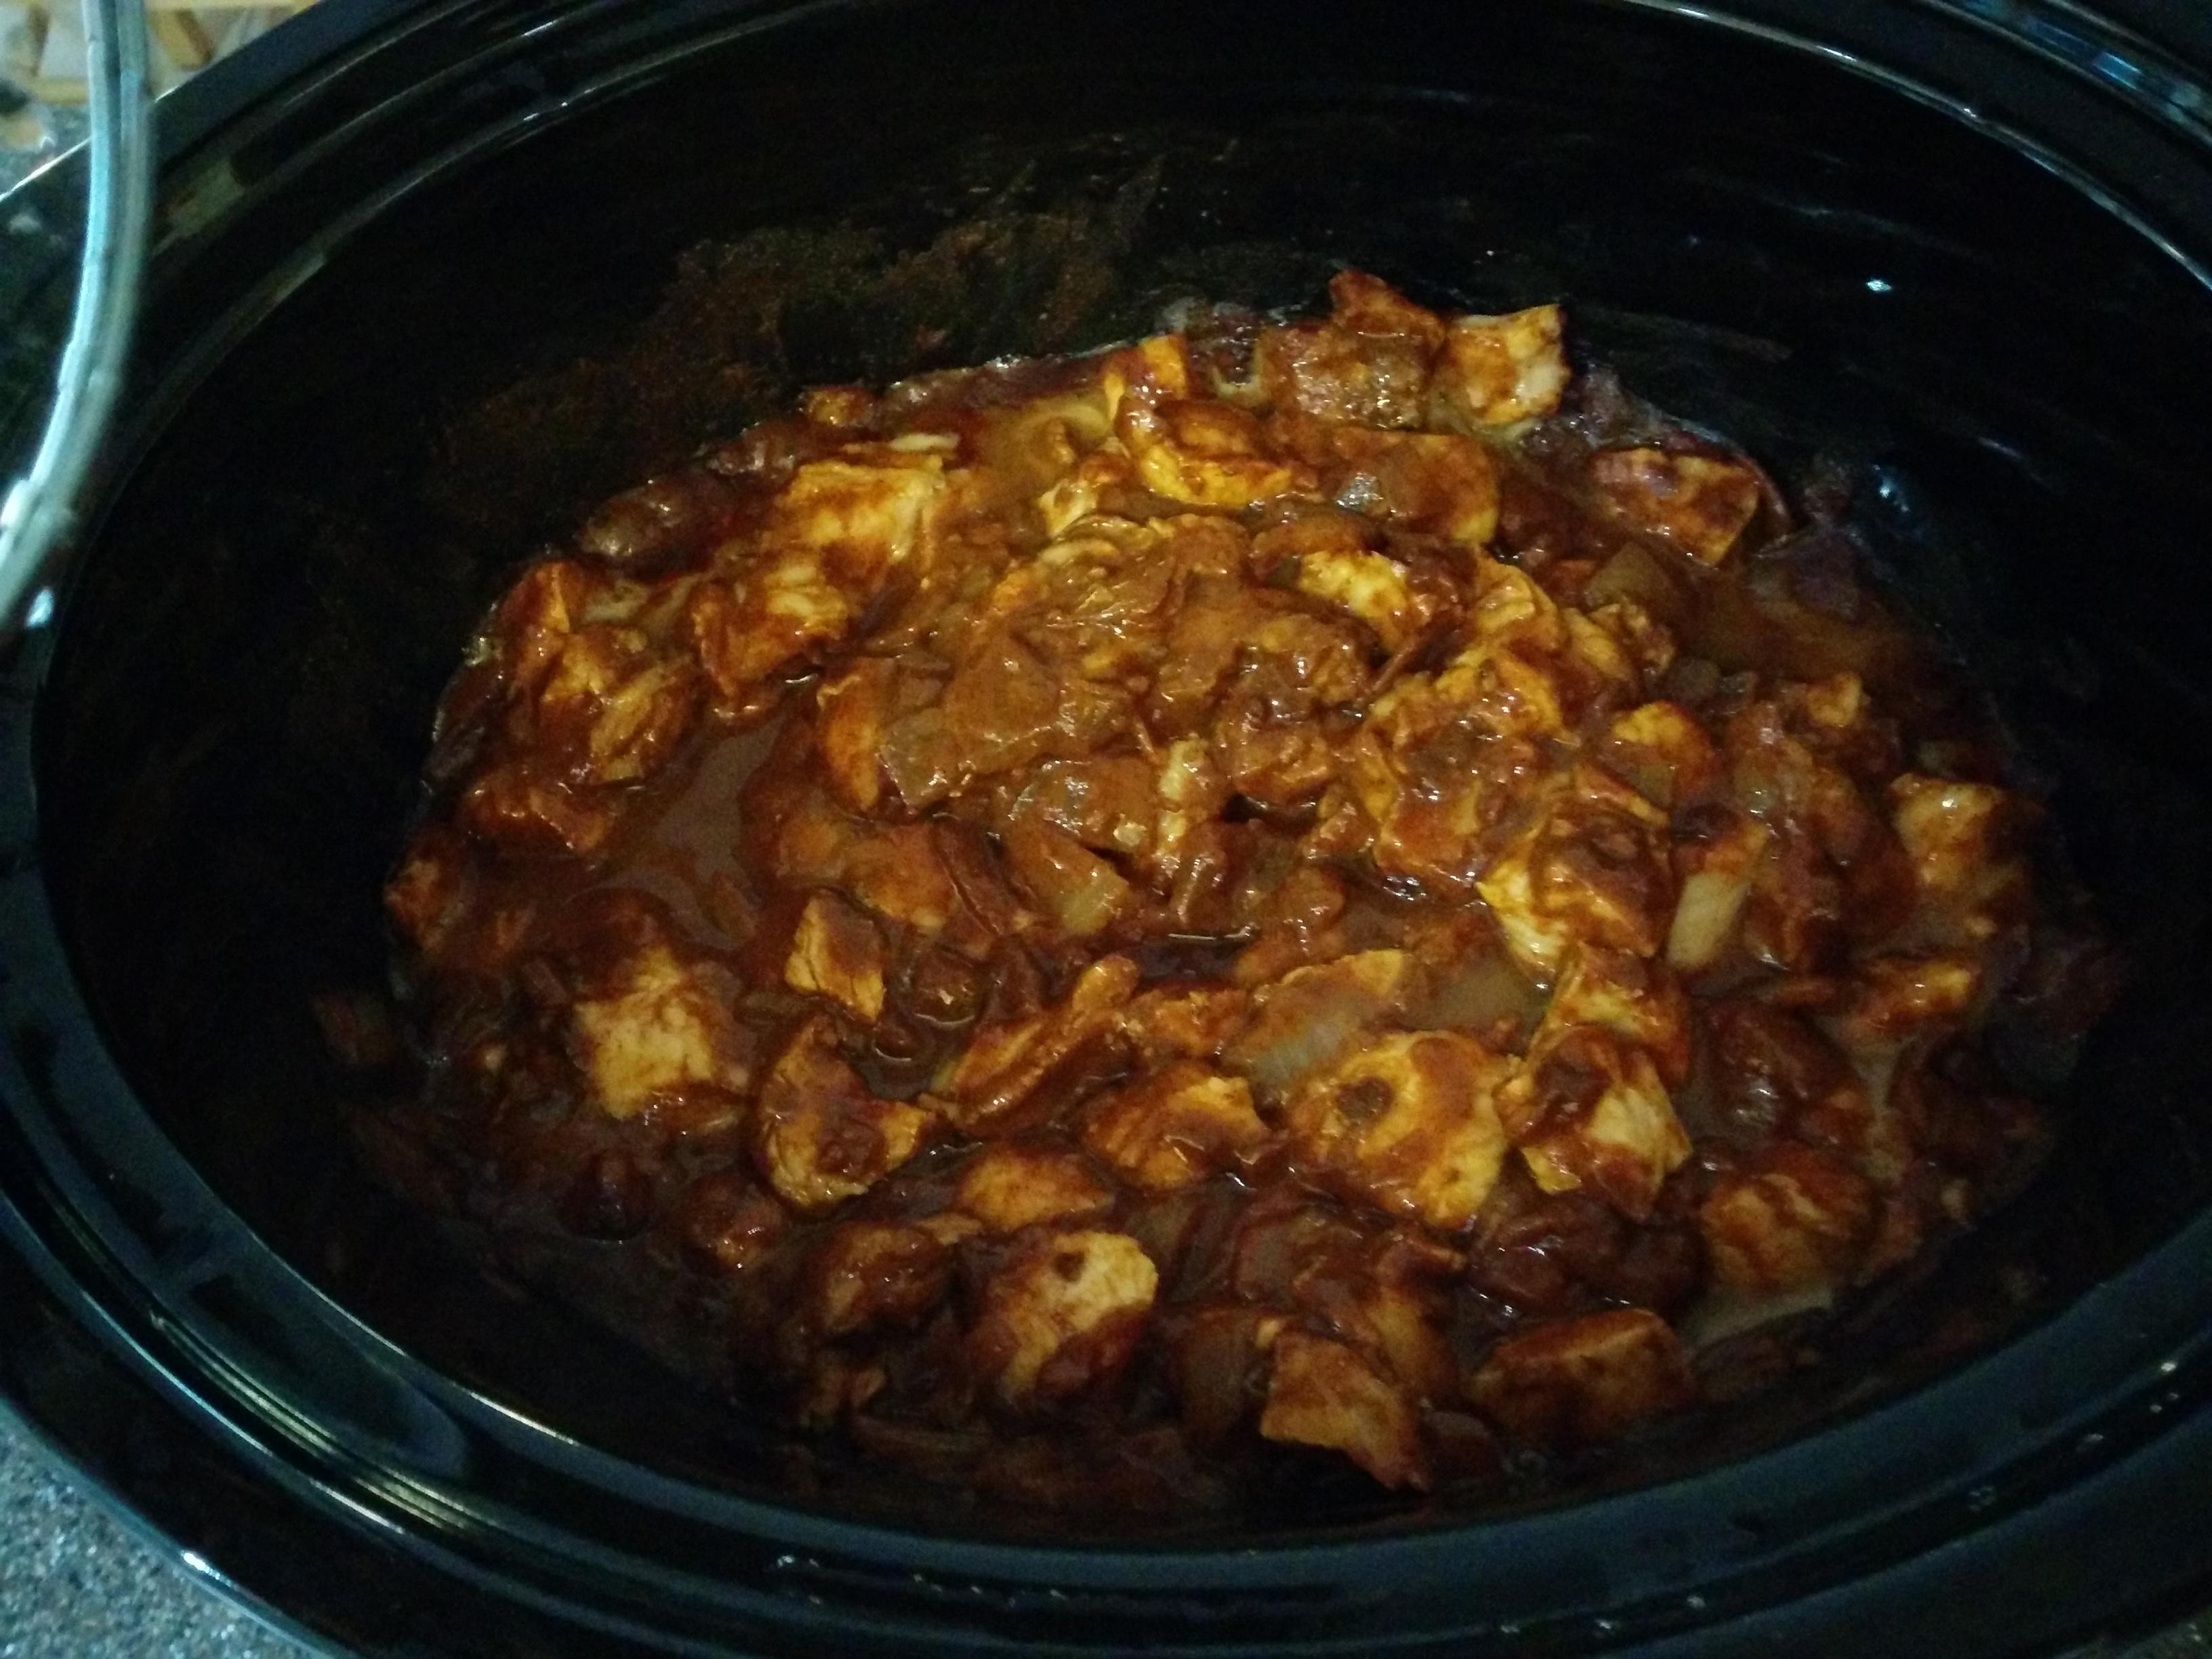 J.C.'s Slow Cooker Carne Adovada